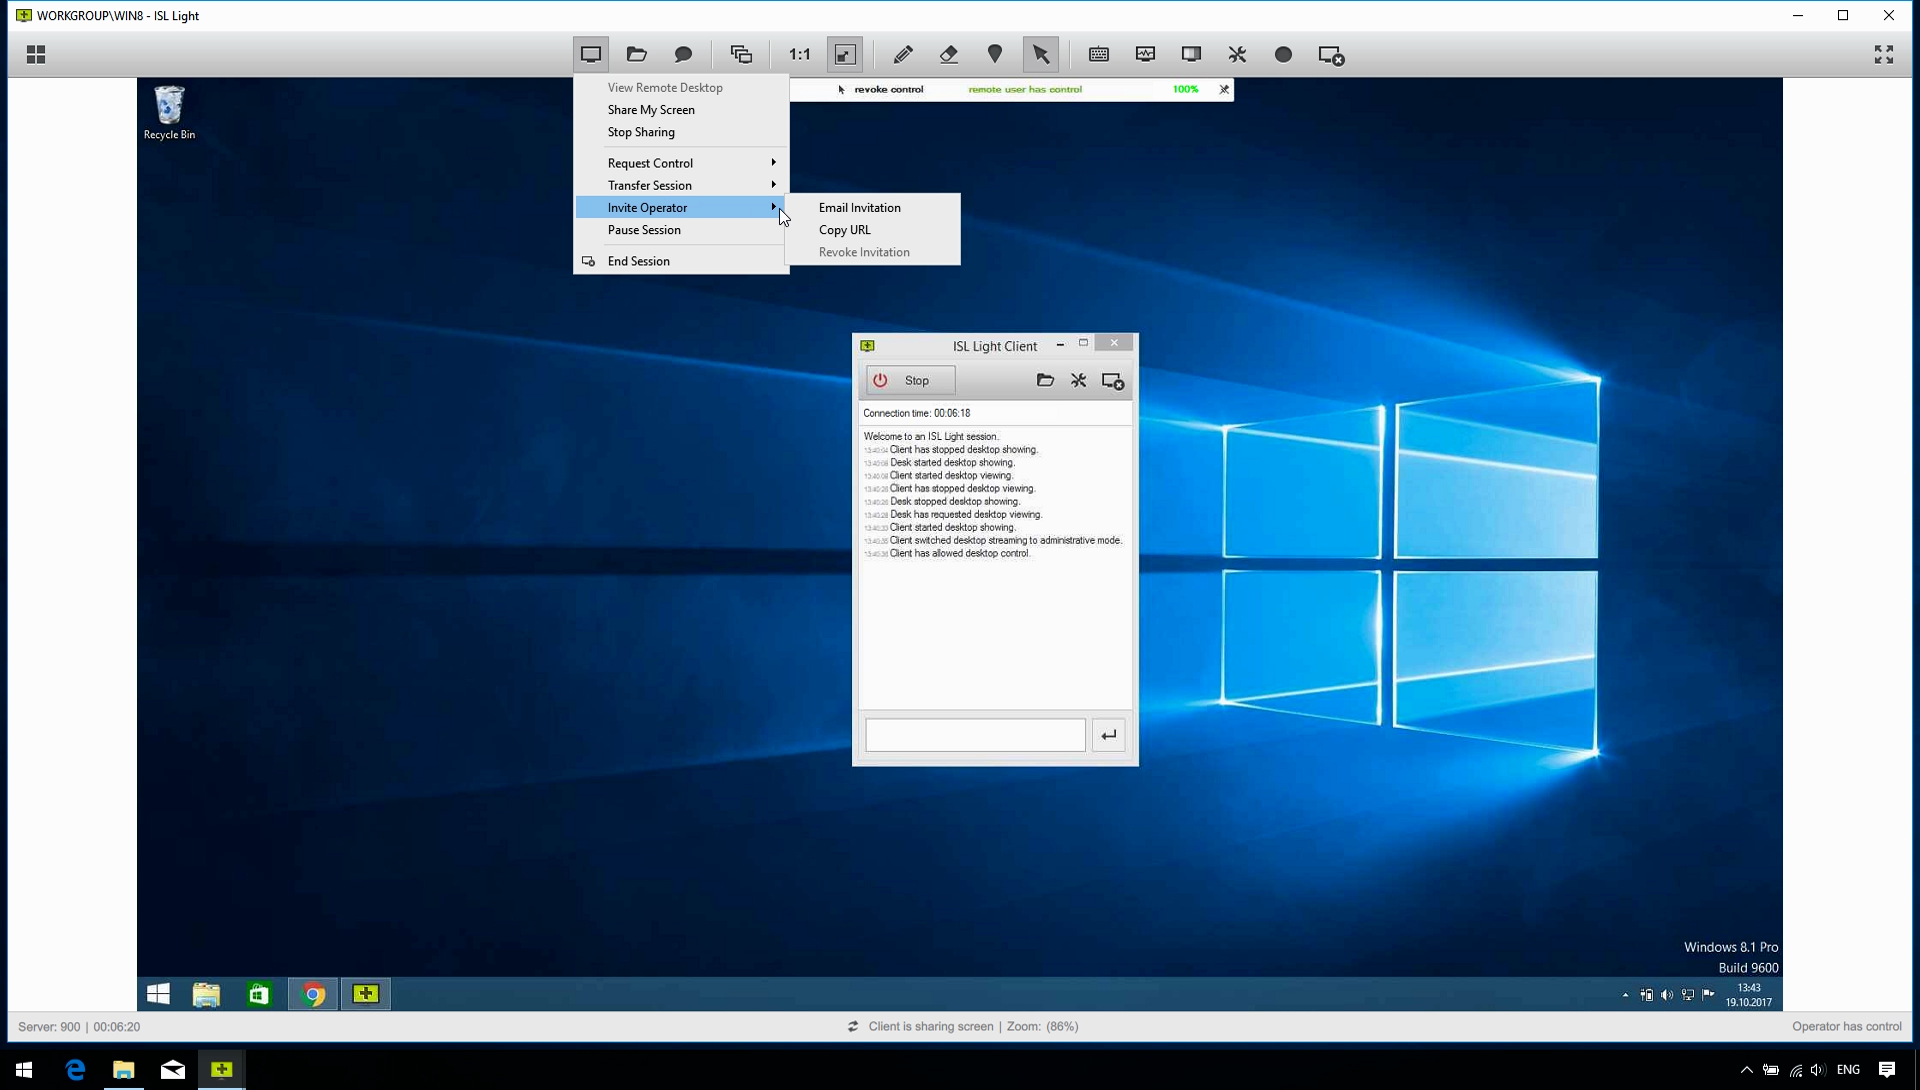 Remote Desktop Features